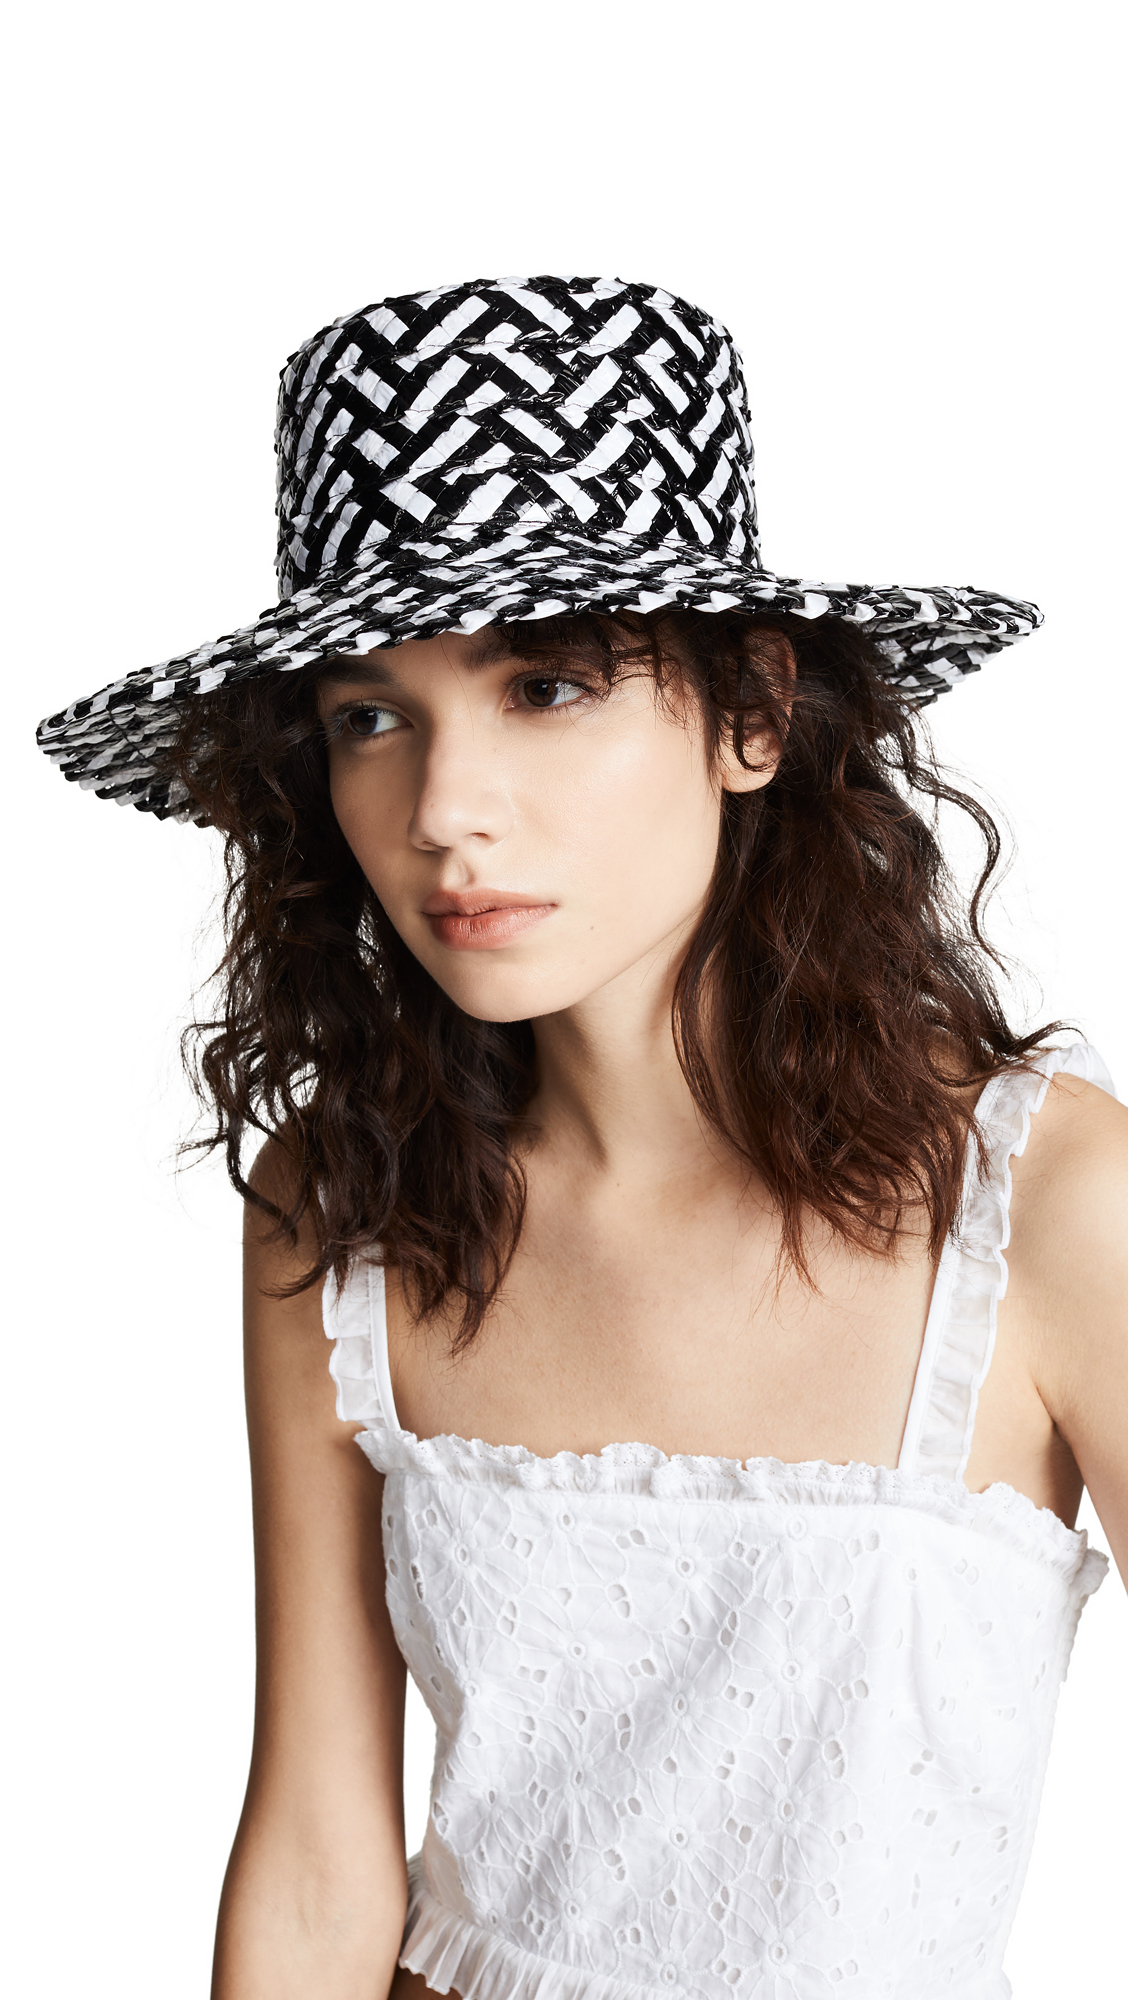 Stevie Straw Hat - White in White/Black